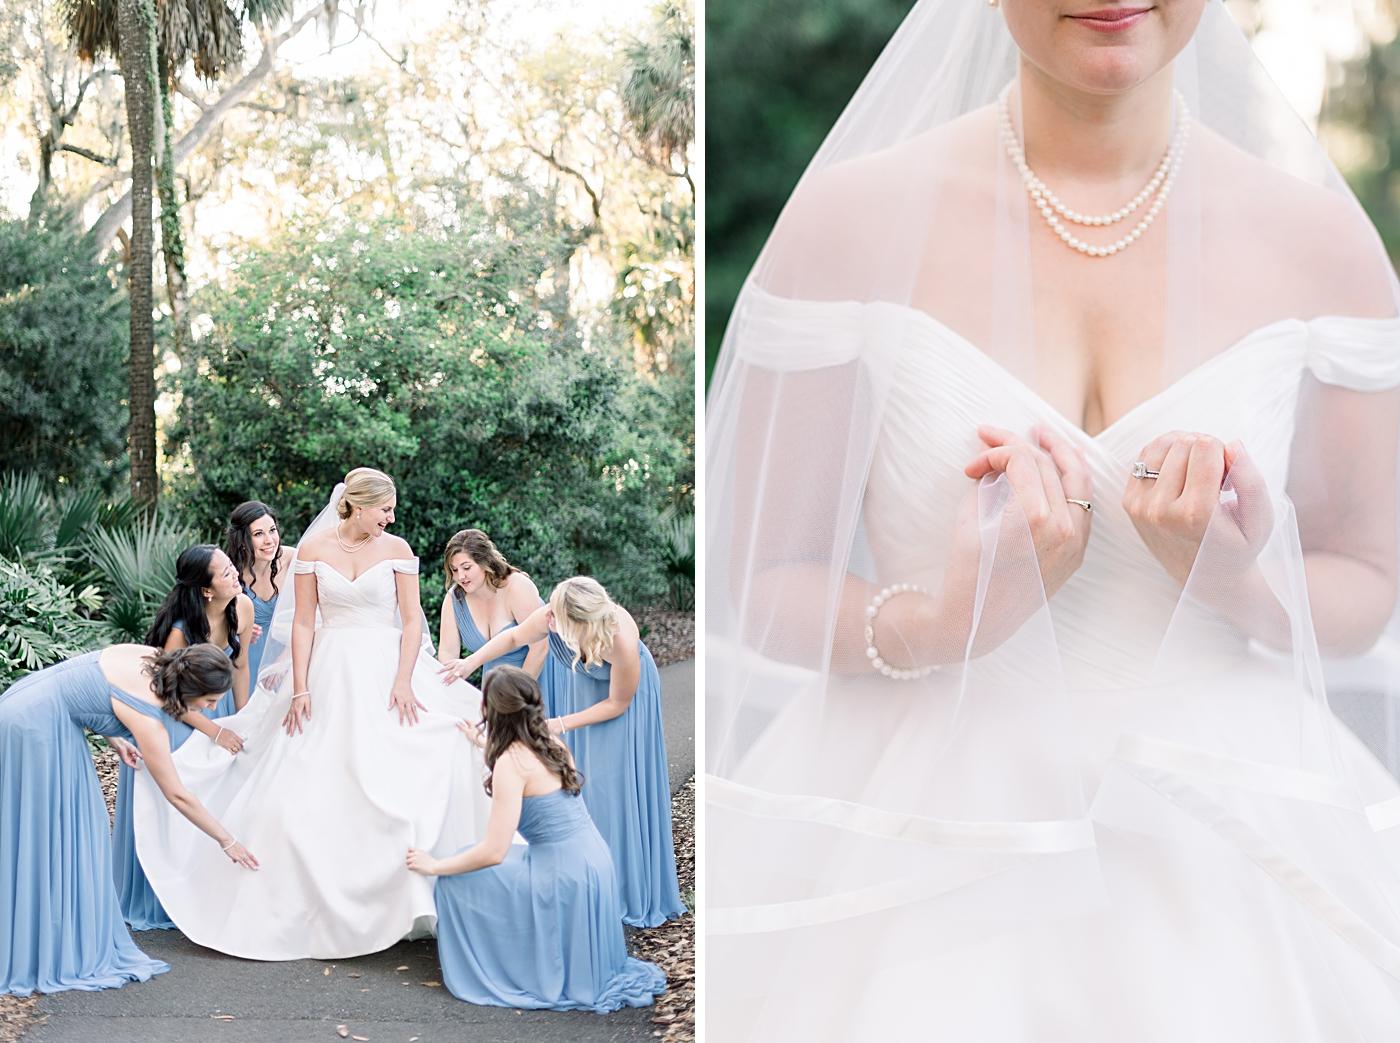 anne barge wedding dress - bok tower wedding